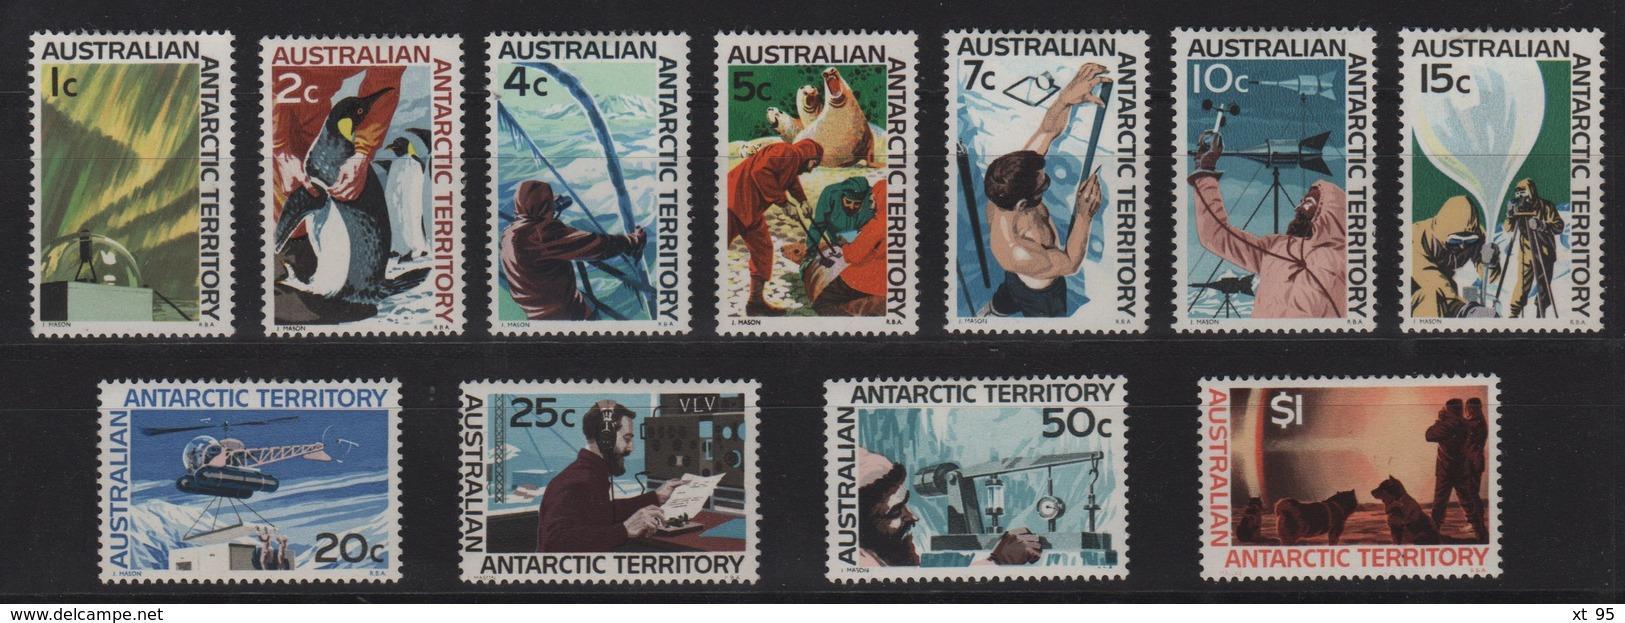 Australie - Territoire Antarctique - N°8 à N°18 - Cote 120€ - * - Neufs Avec Charniere - Australian Antarctic Territory (AAT)